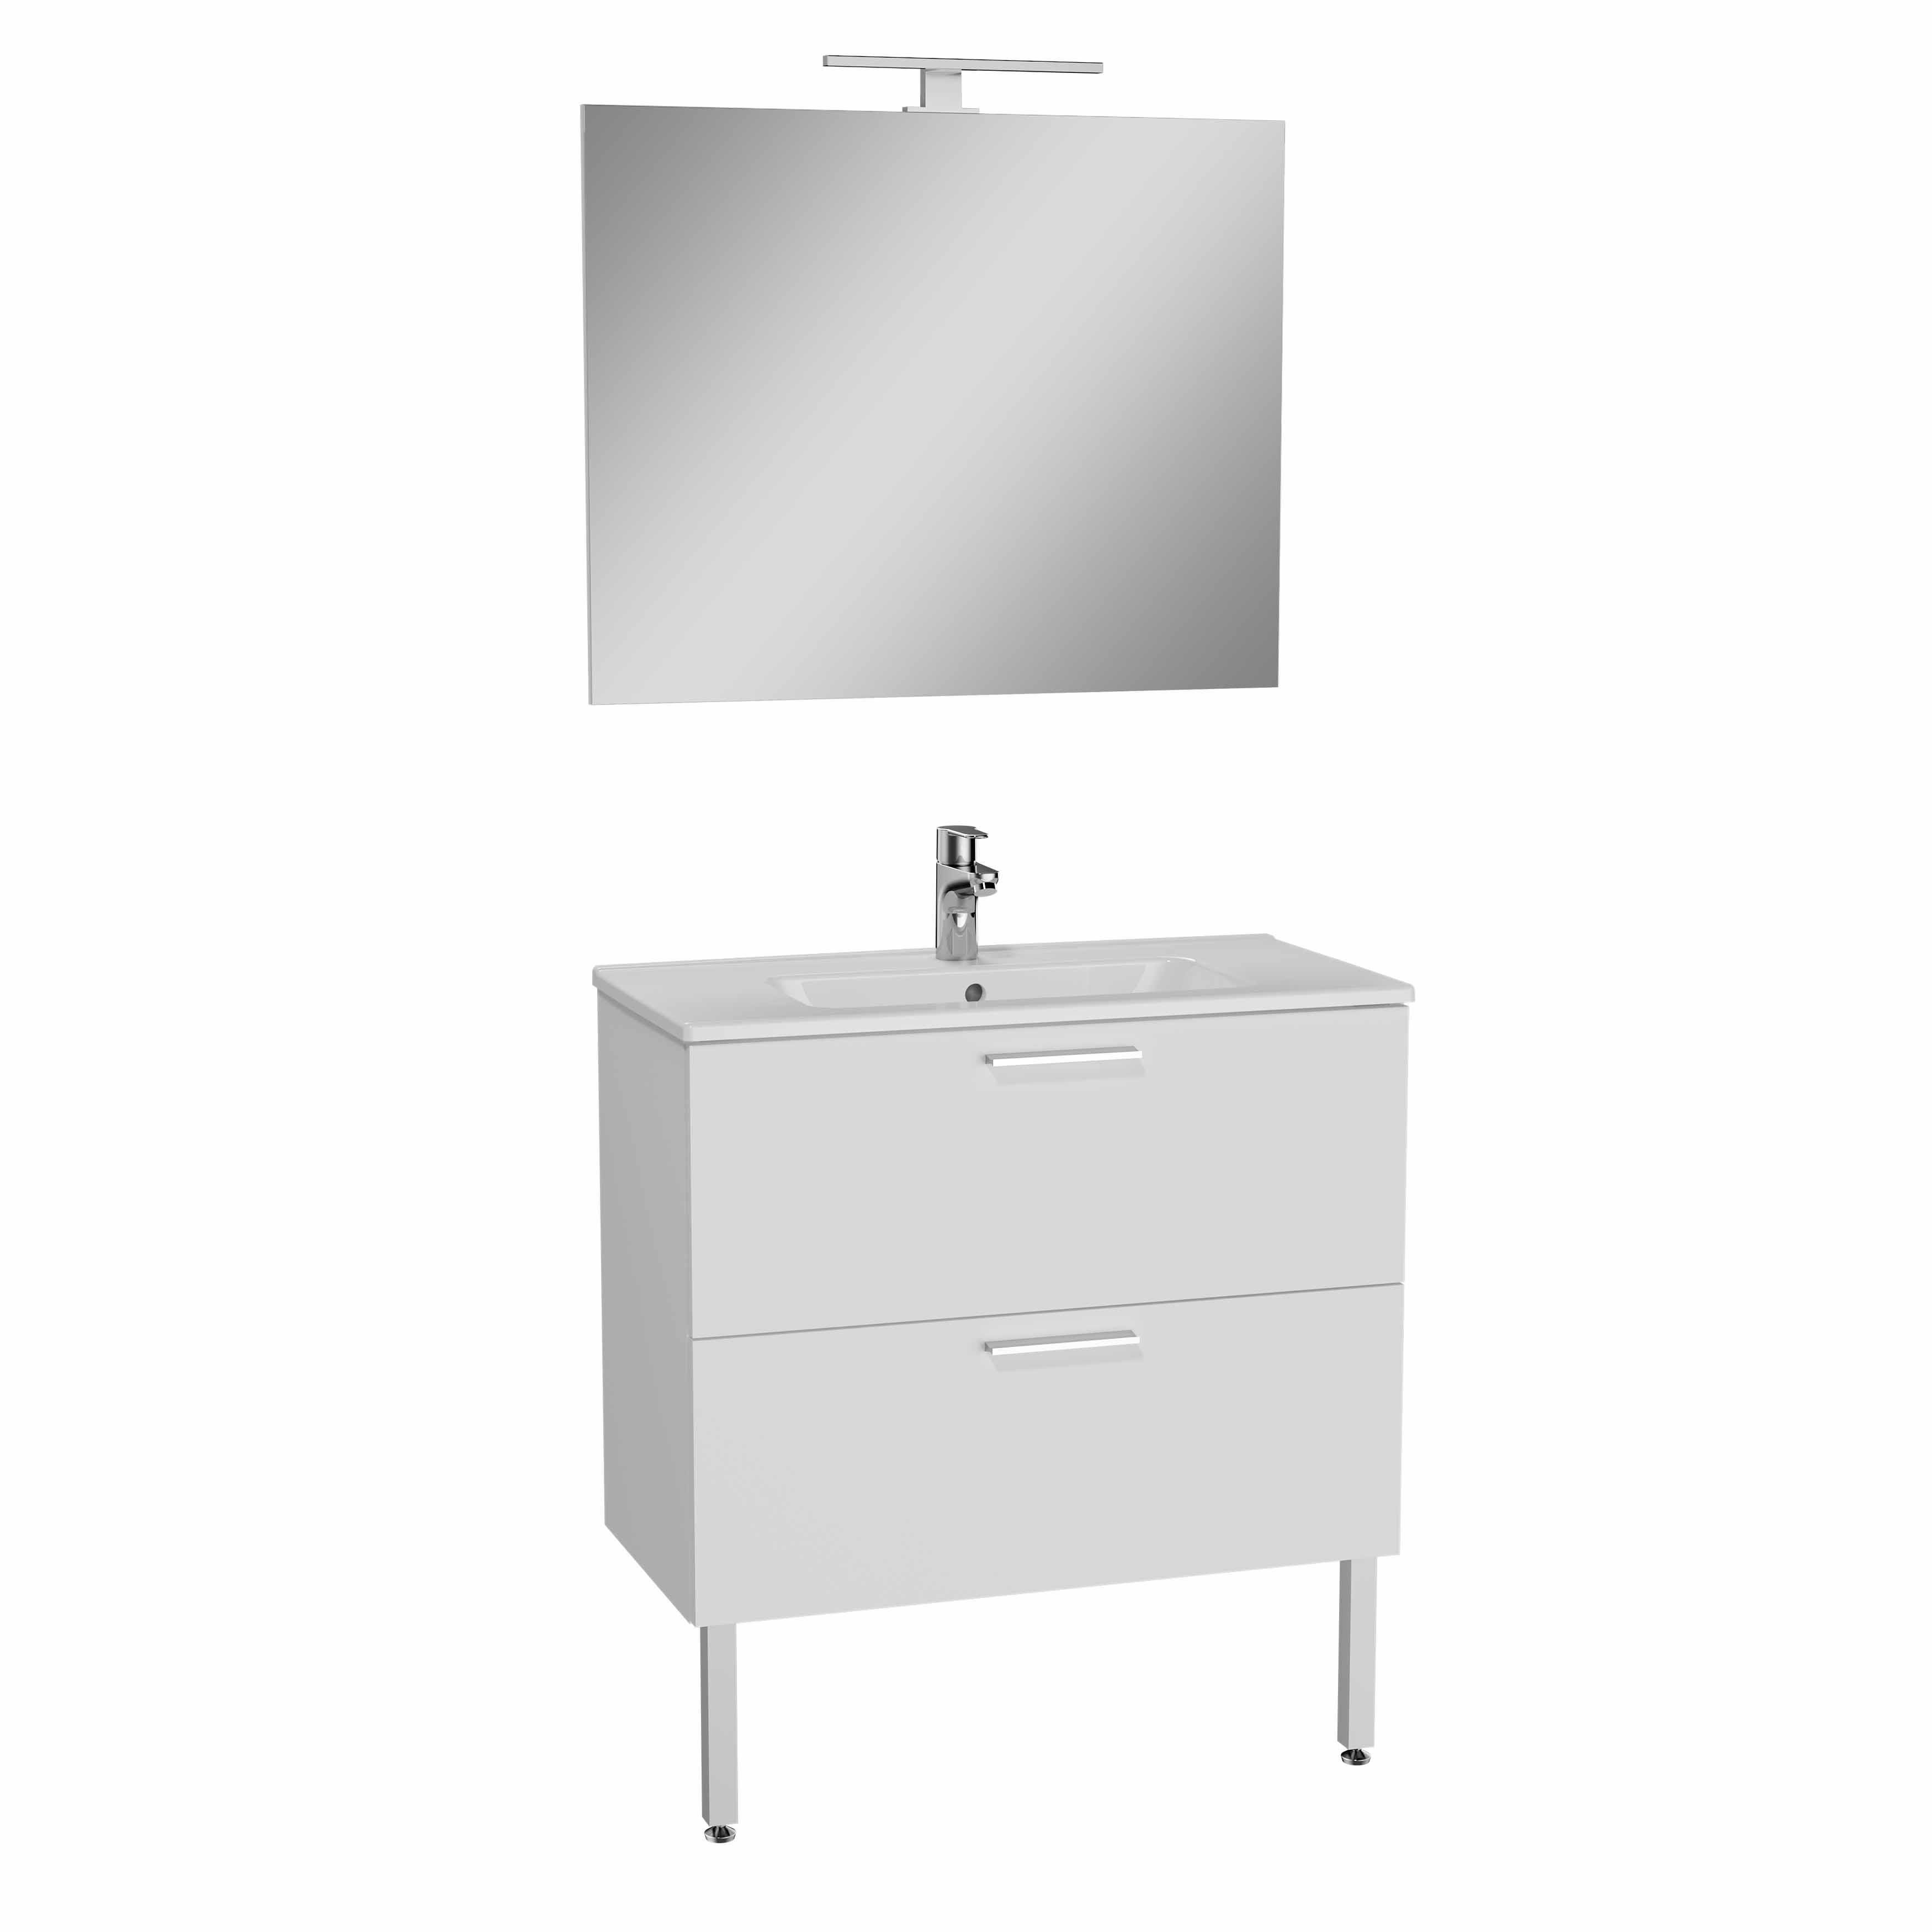 Mia set de meuble, avec 2 tiroirs, 80 cm, blanc